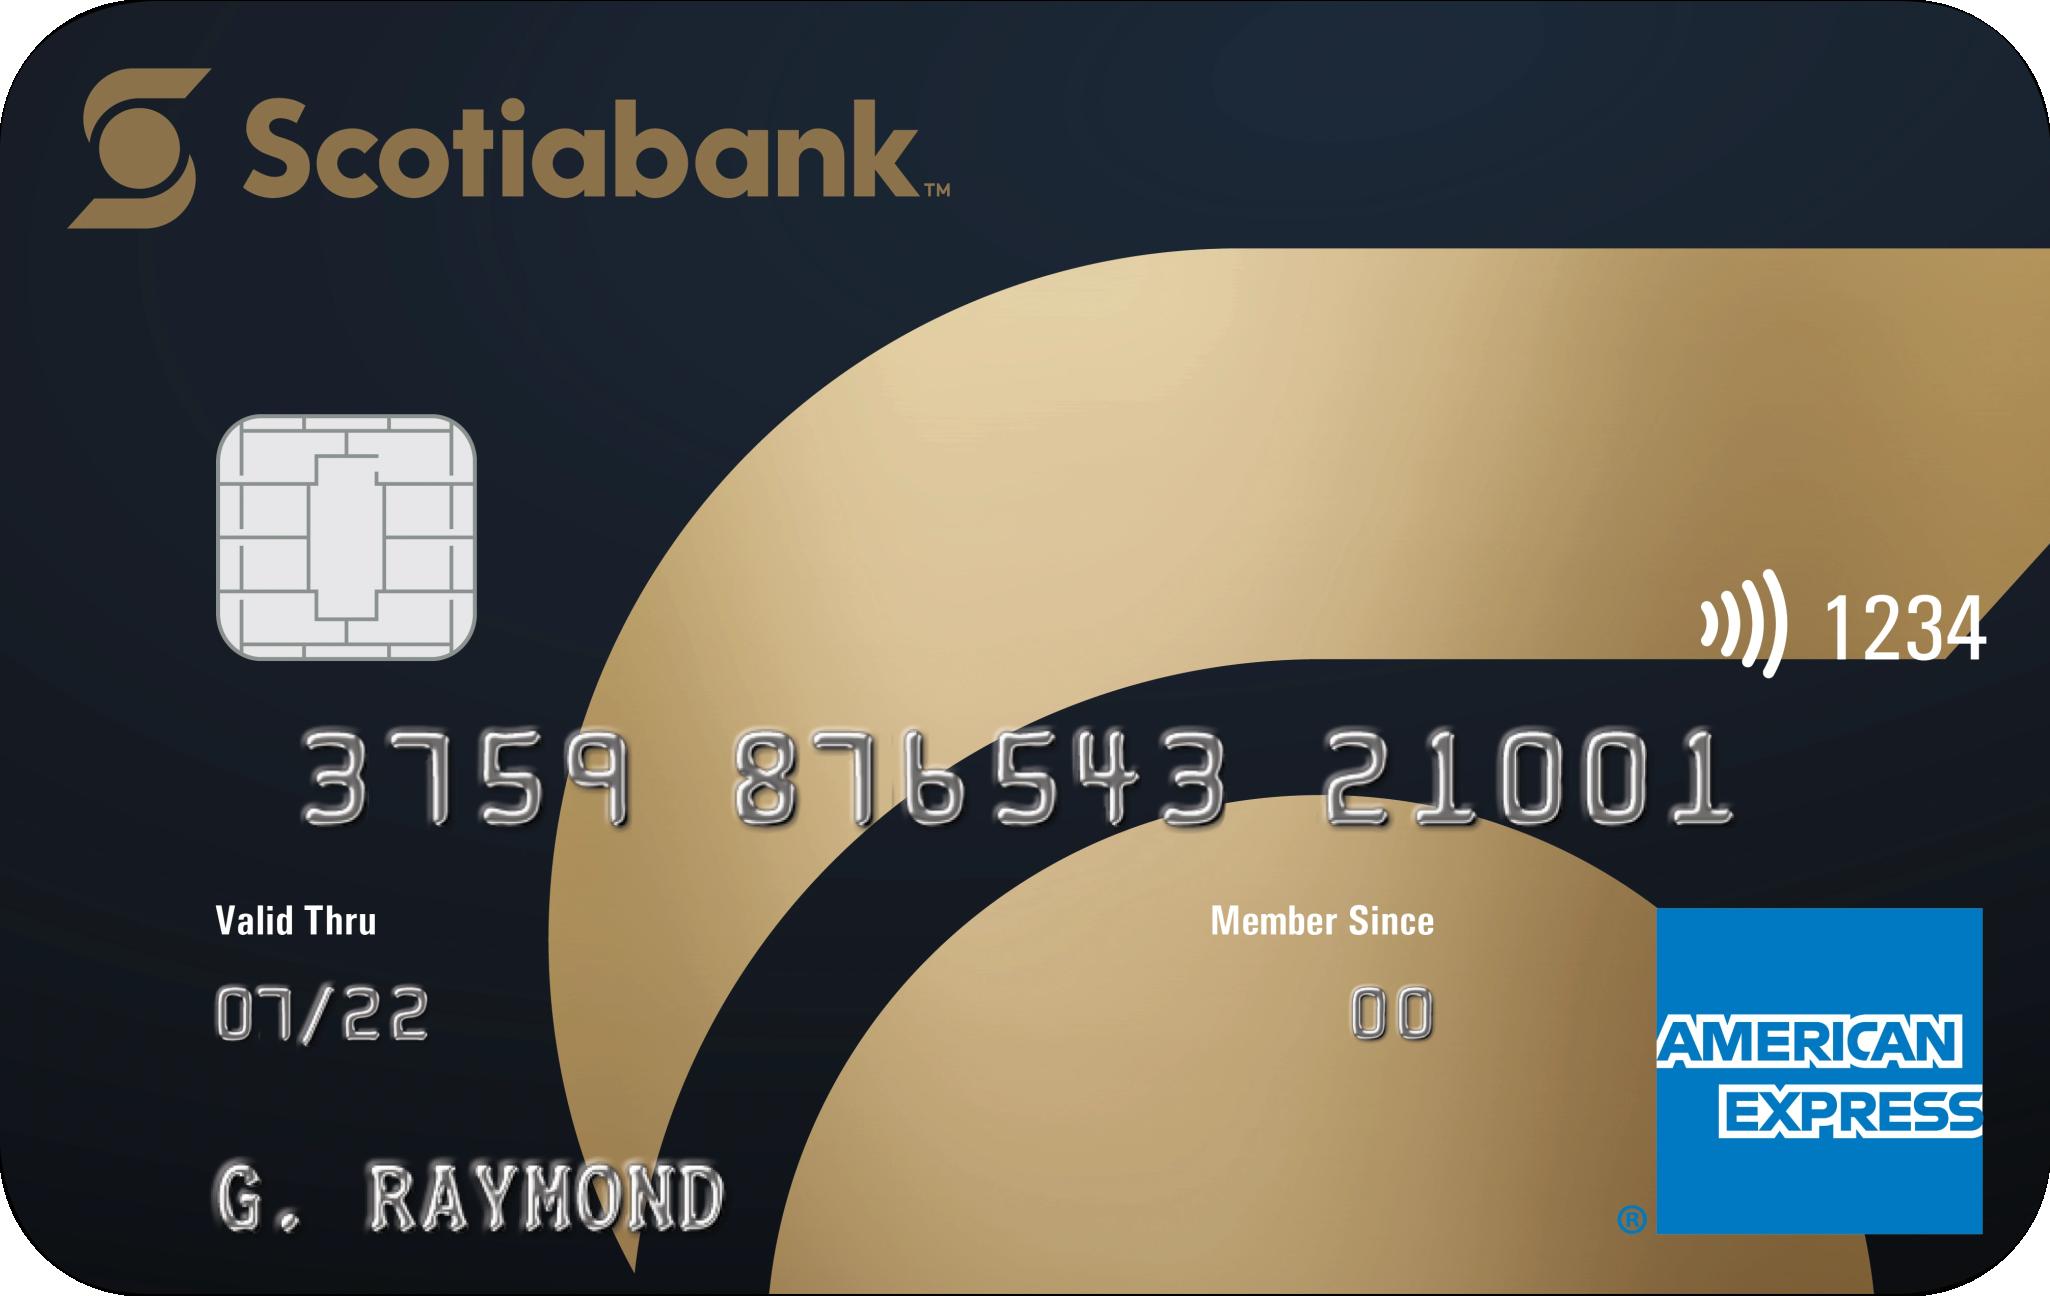 Scotiabank® Gold American Express® card logo